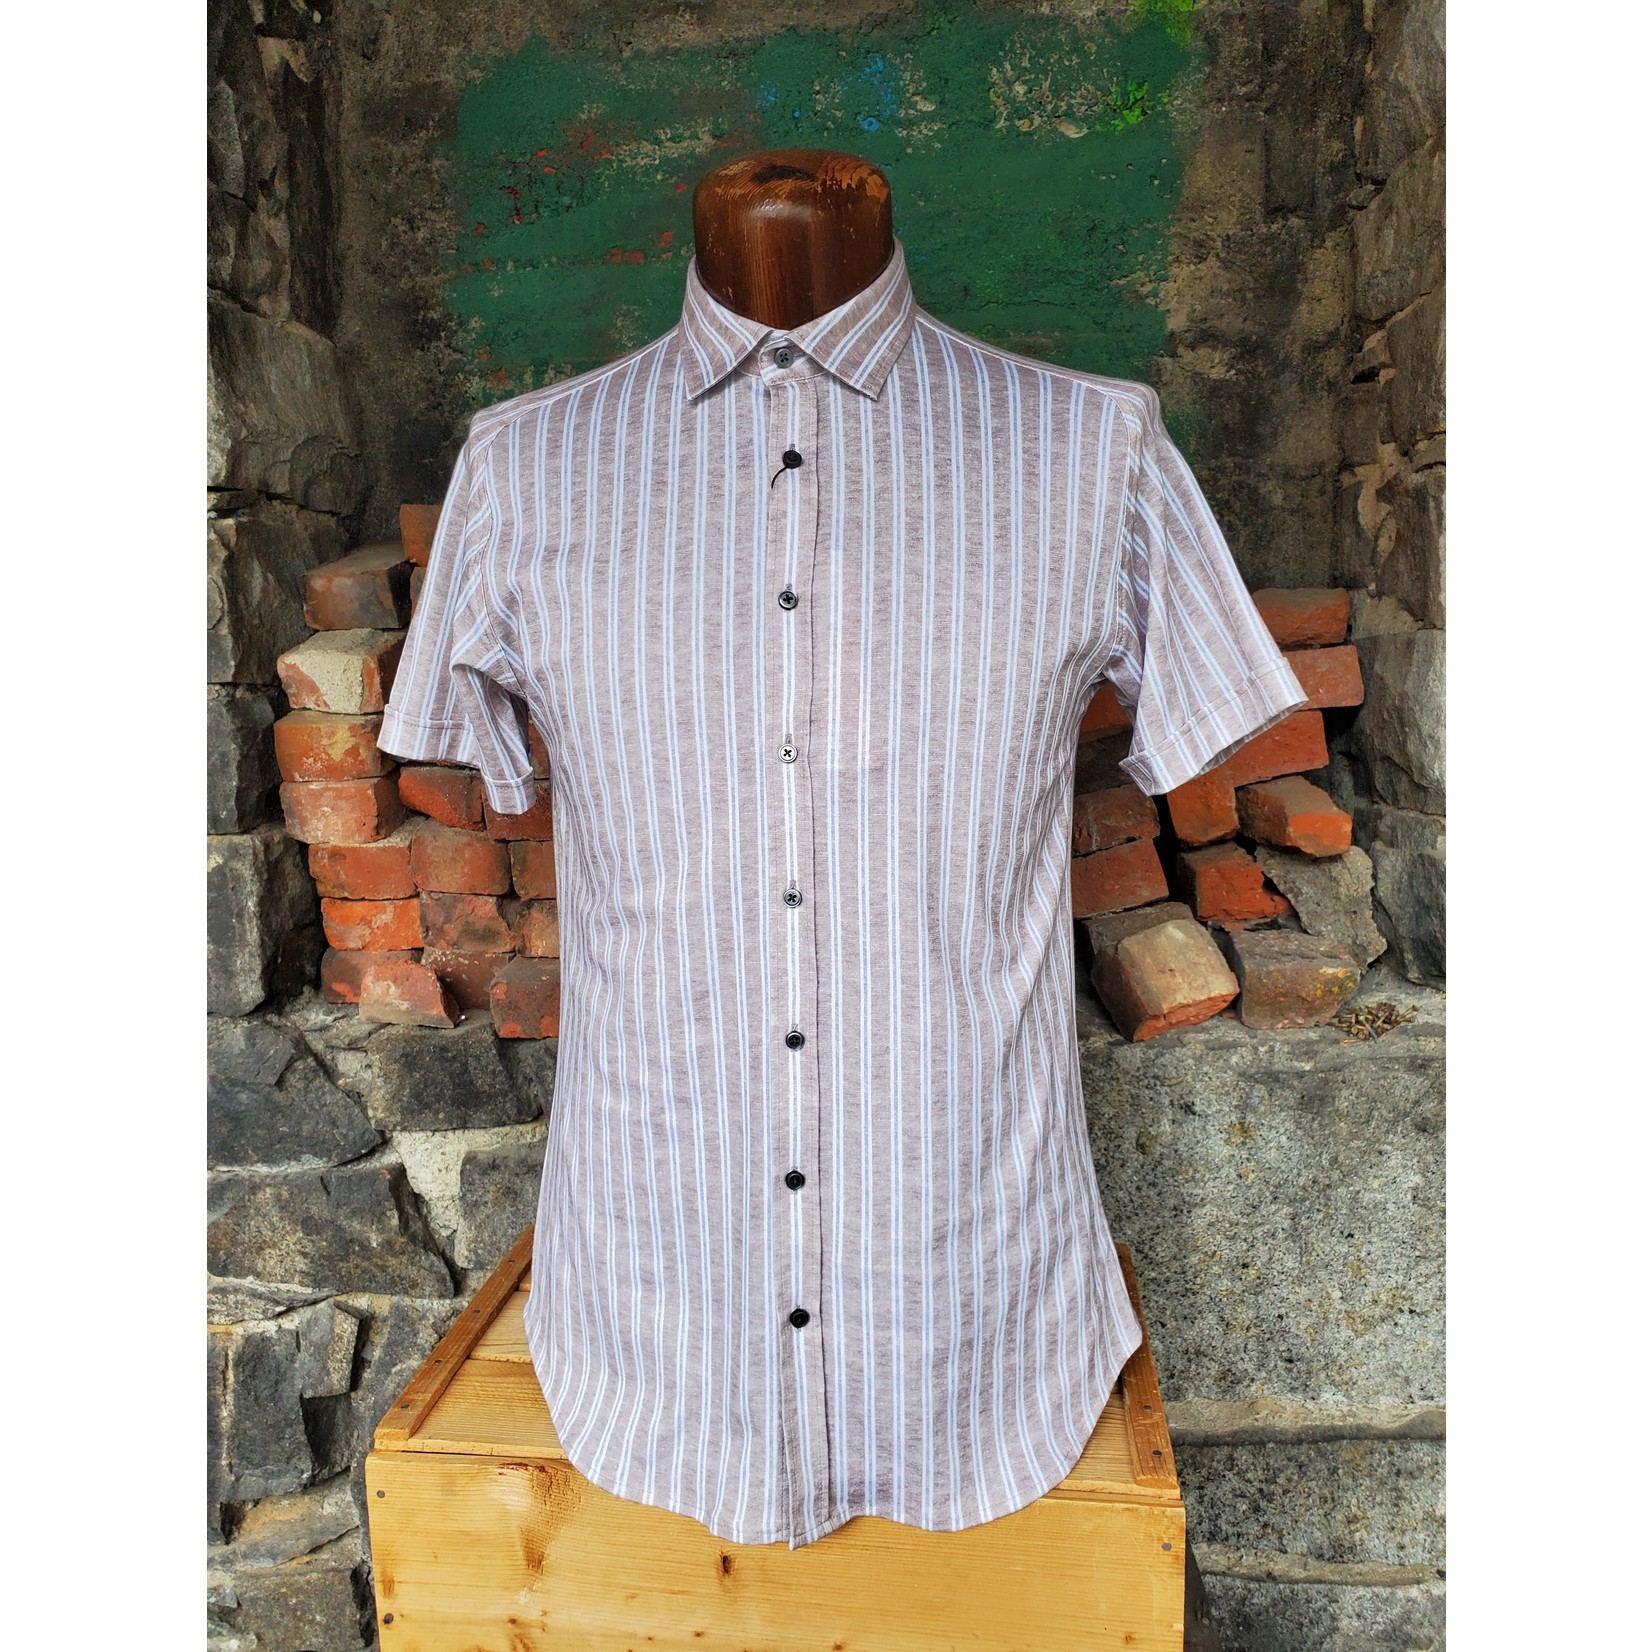 Desoto Desoto 433-35-3 Short-Sleeve Printed Spread Collar Jersey Shirt